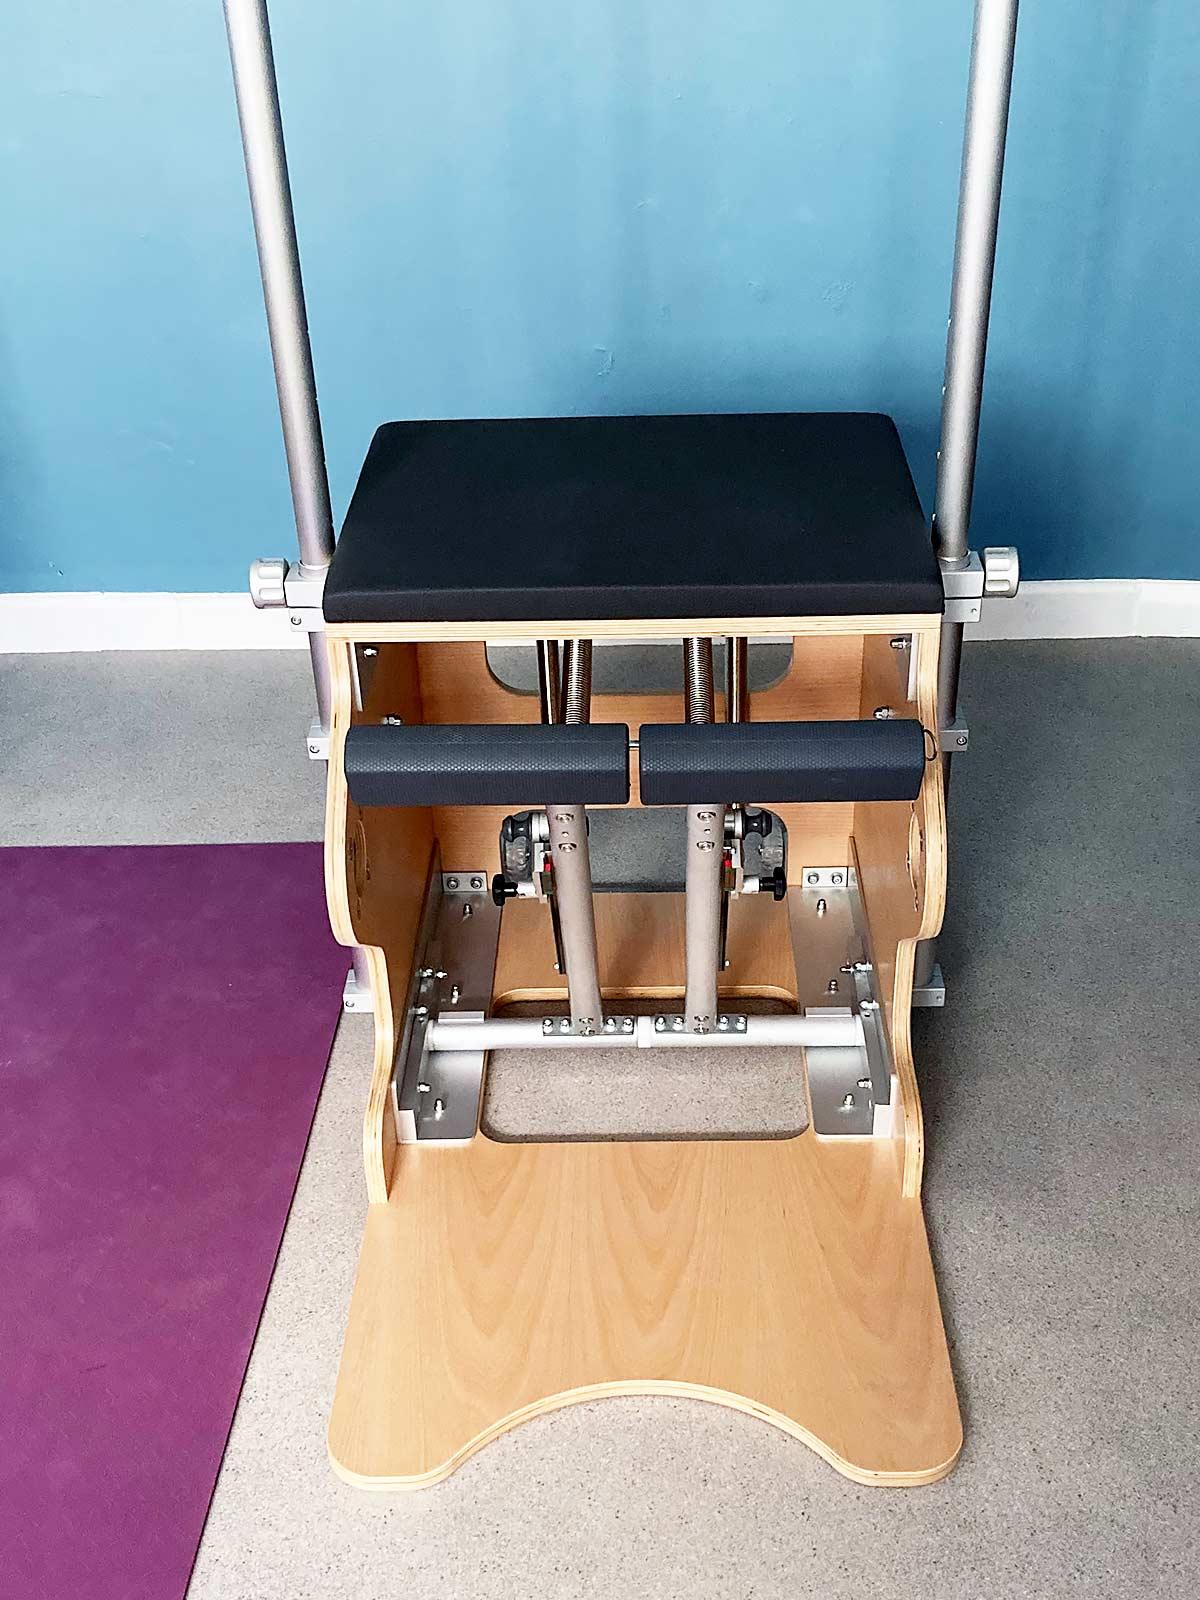 Pilates Wunda Chair at The Studio @53